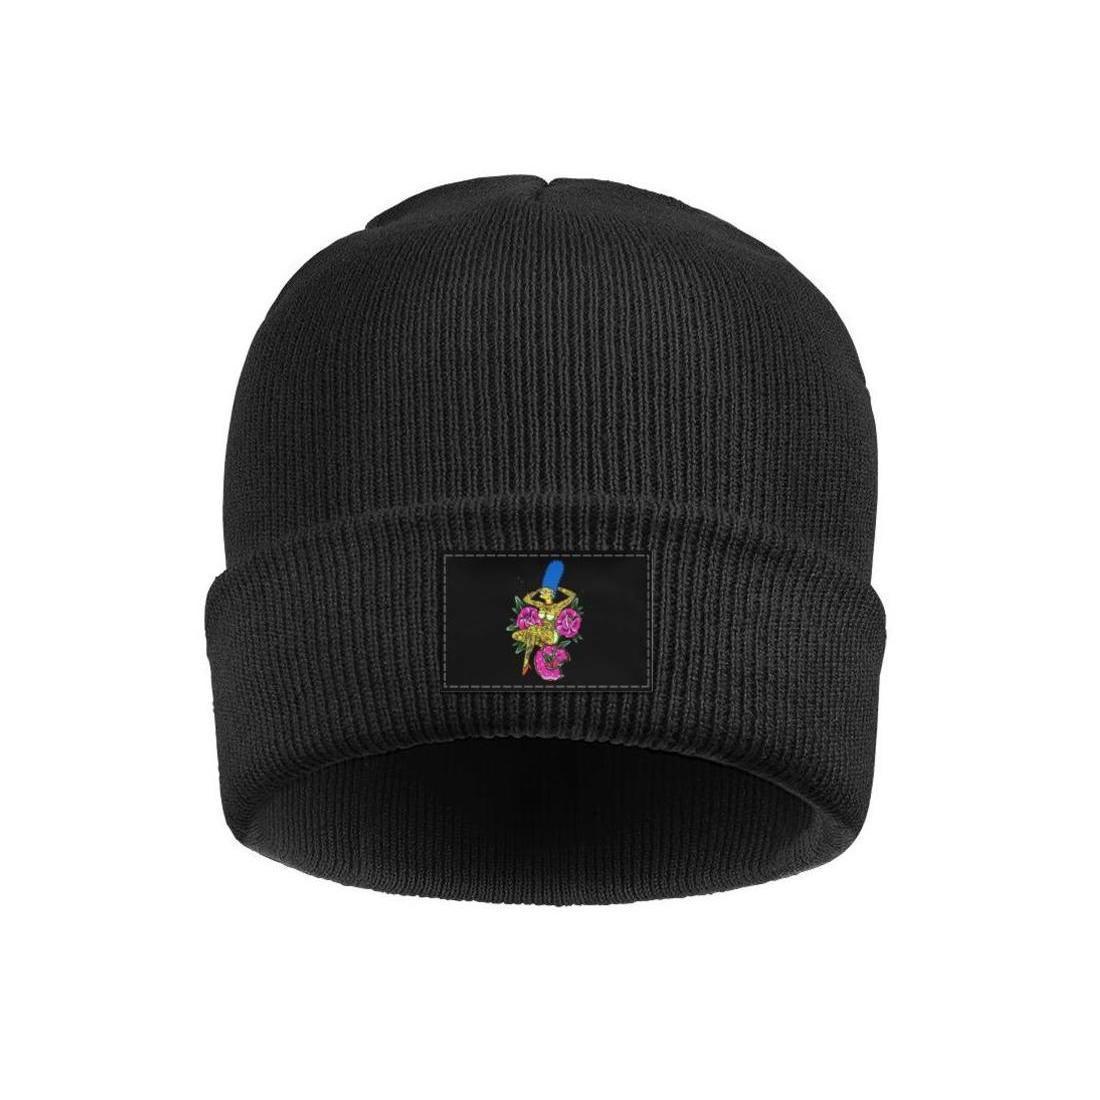 Beanie Hat Warm Hats Skull Cap Knitted Hat Vegan Vegetarian Animal Rights